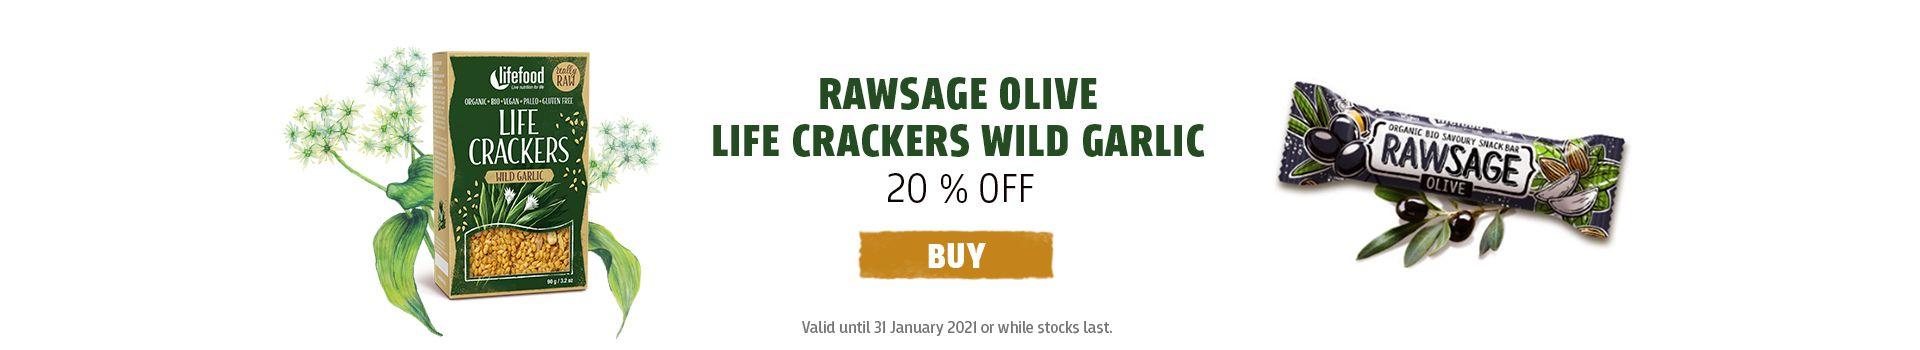 Rawsage + Crackers